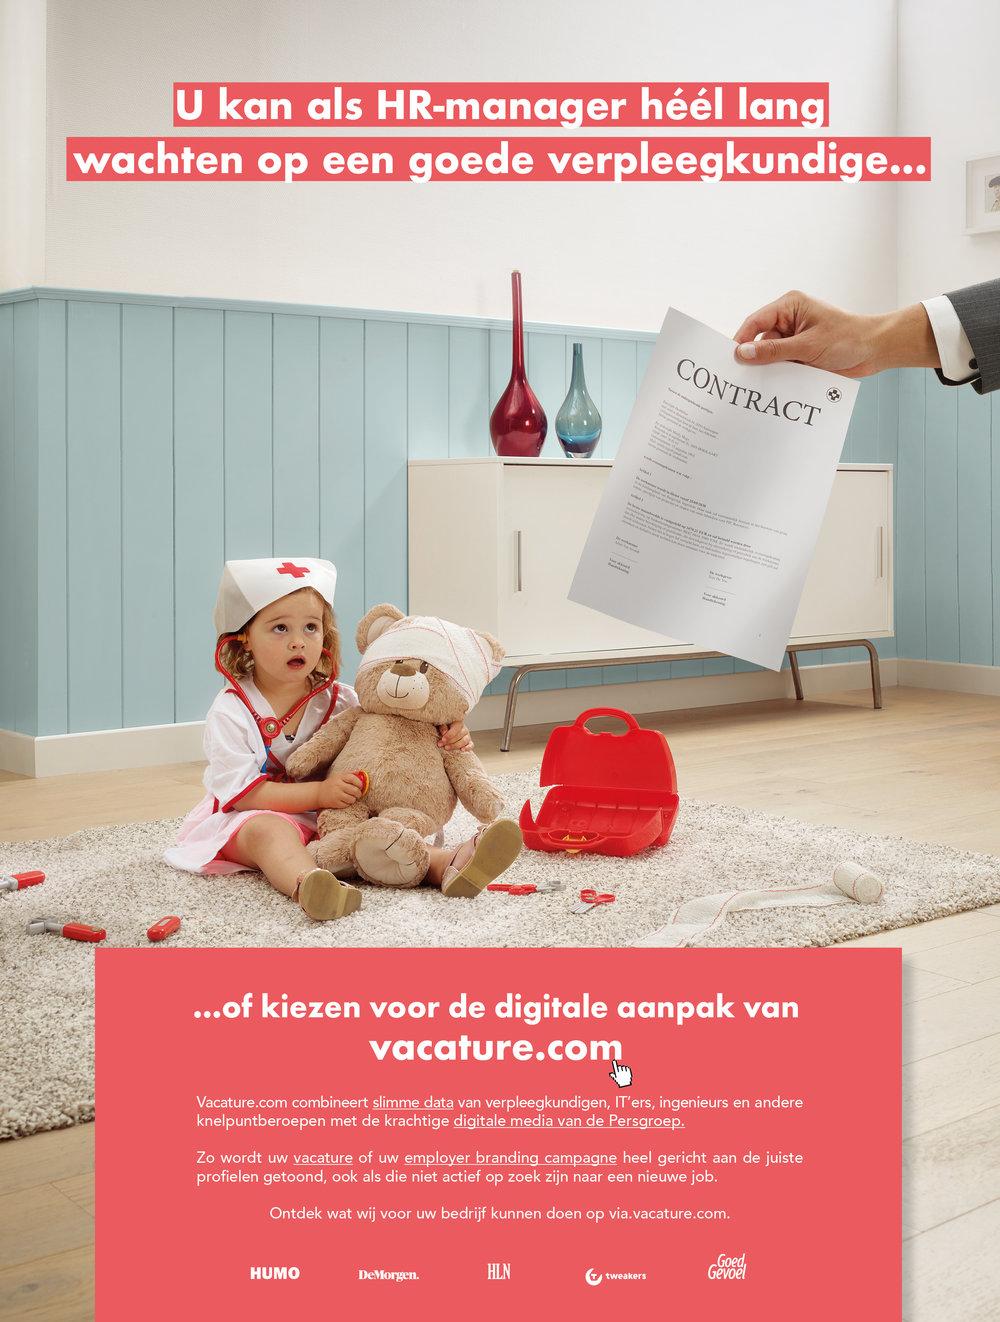 Vacature-knack_Verpleegkundige.jpg